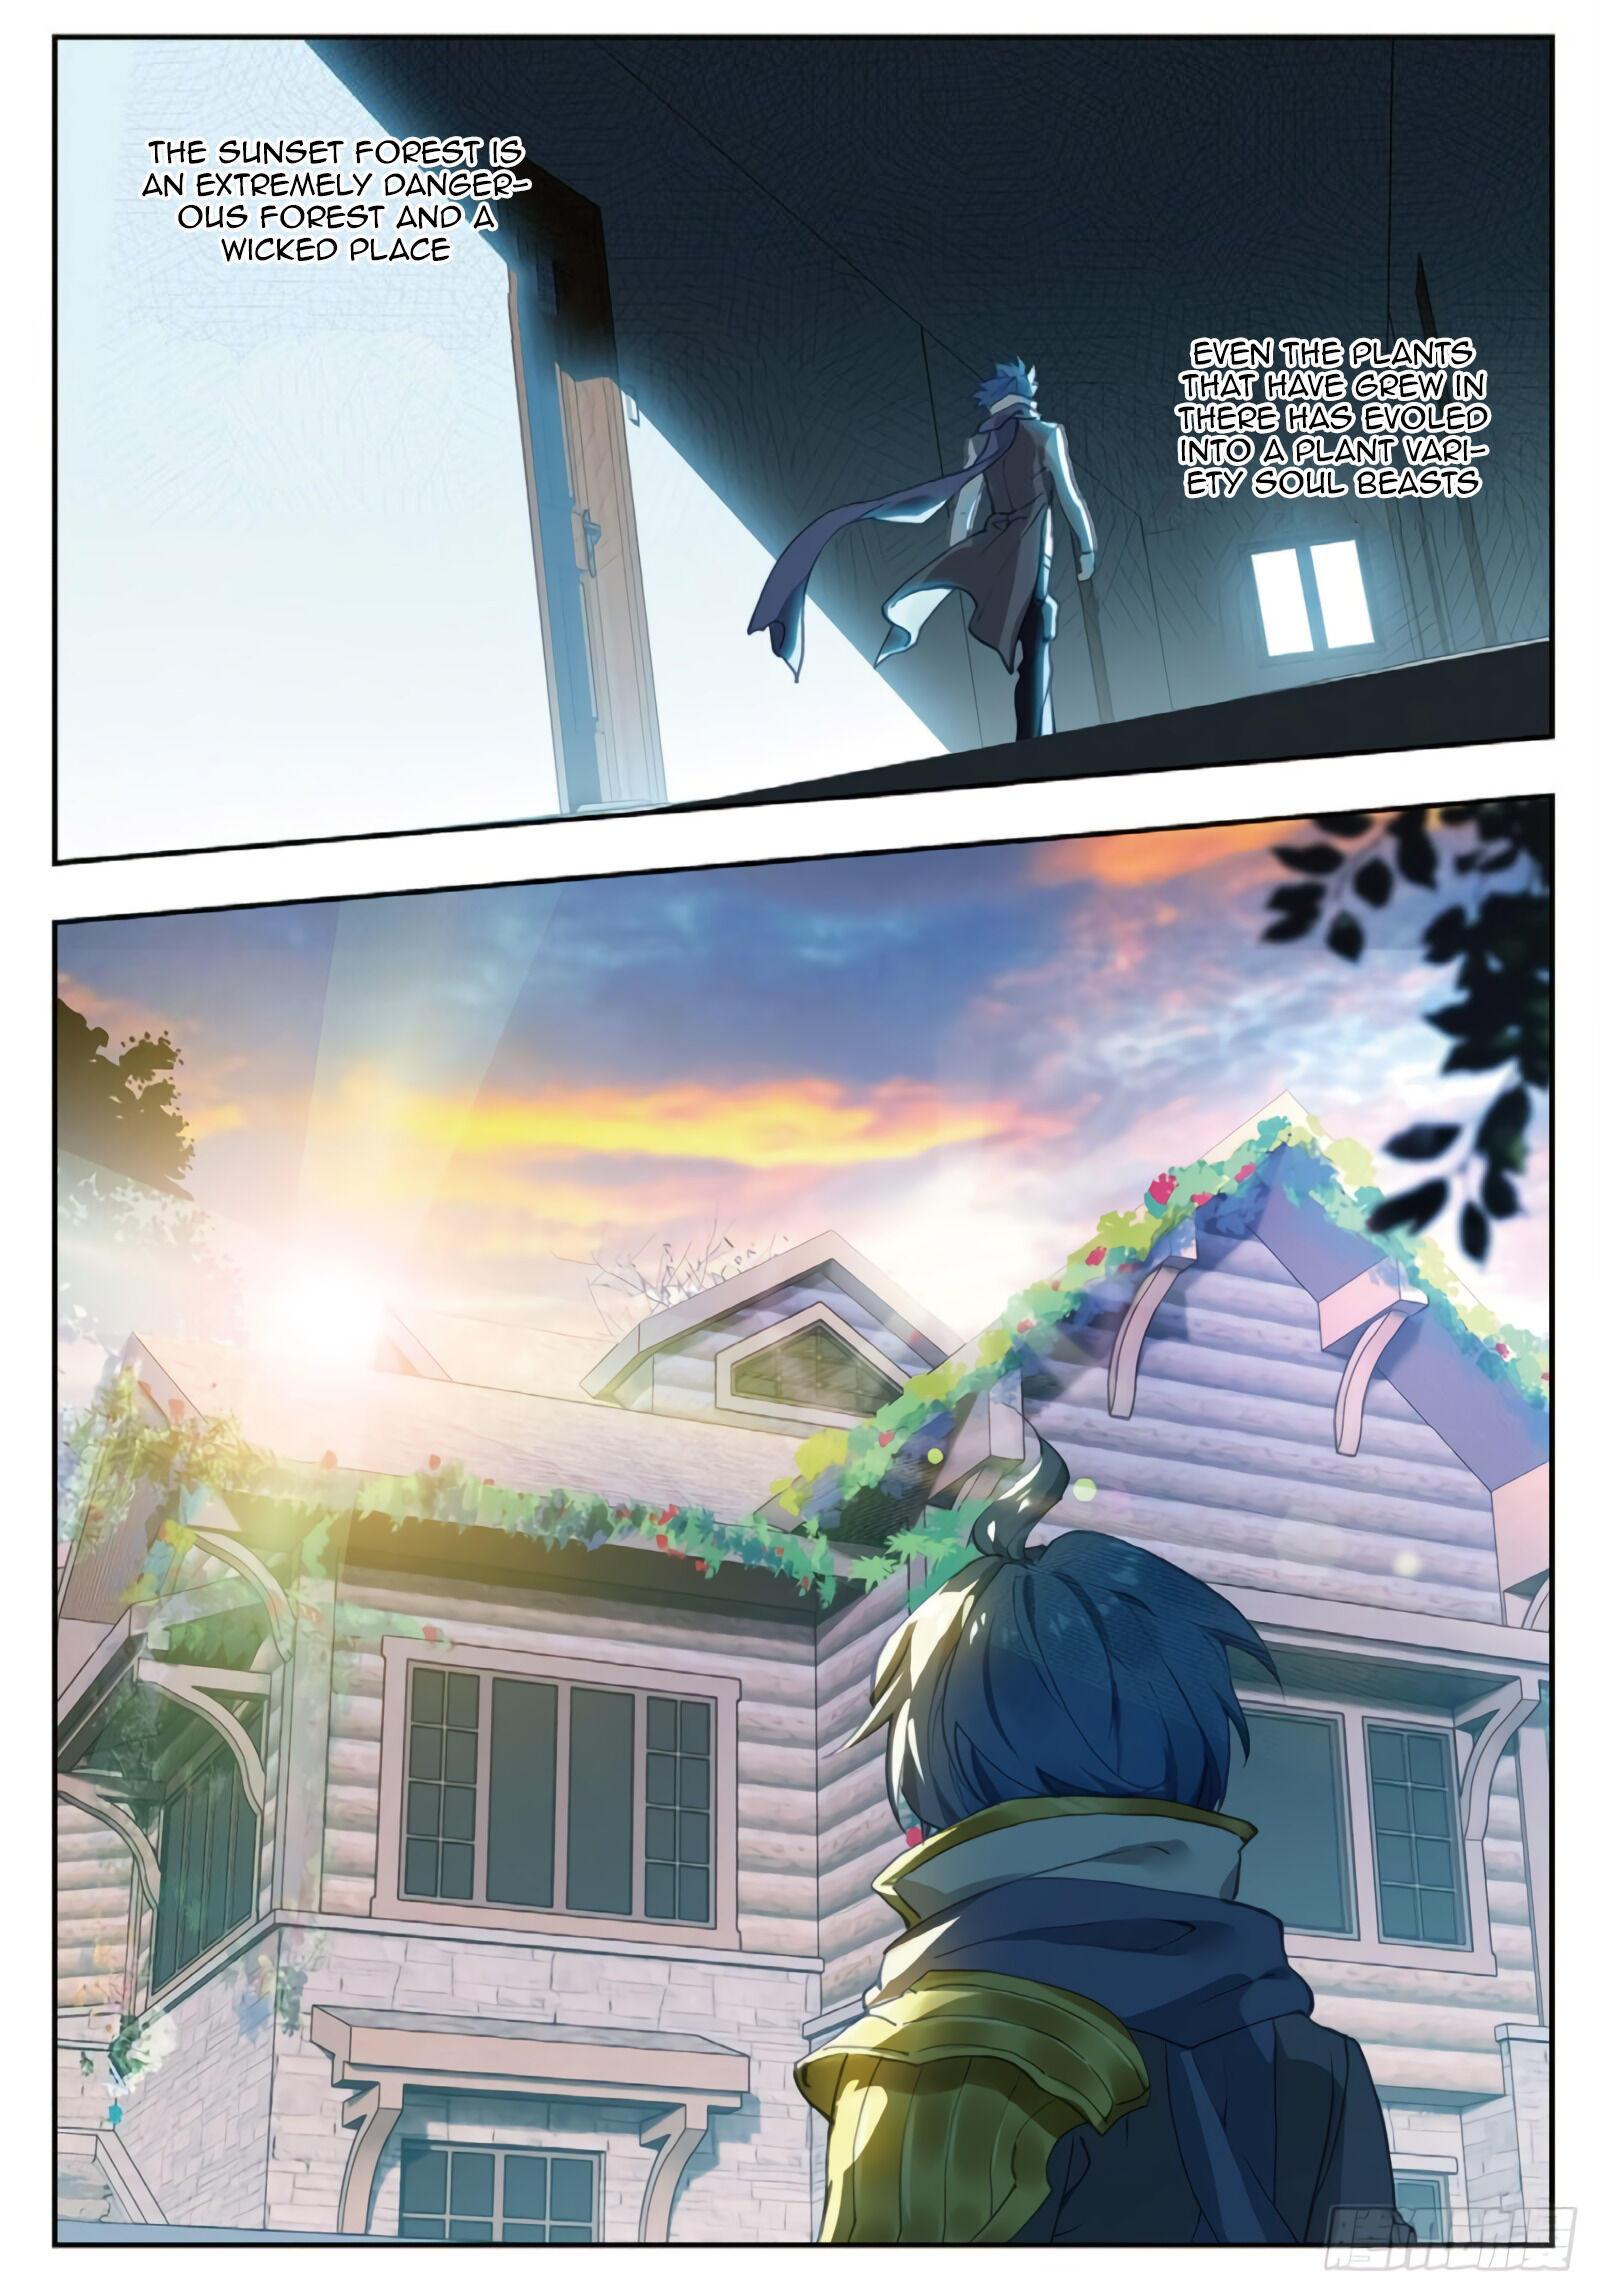 Douluo Dalu Ii - Jueshui Tangmen Chapter 283 page 8 - Mangakakalot